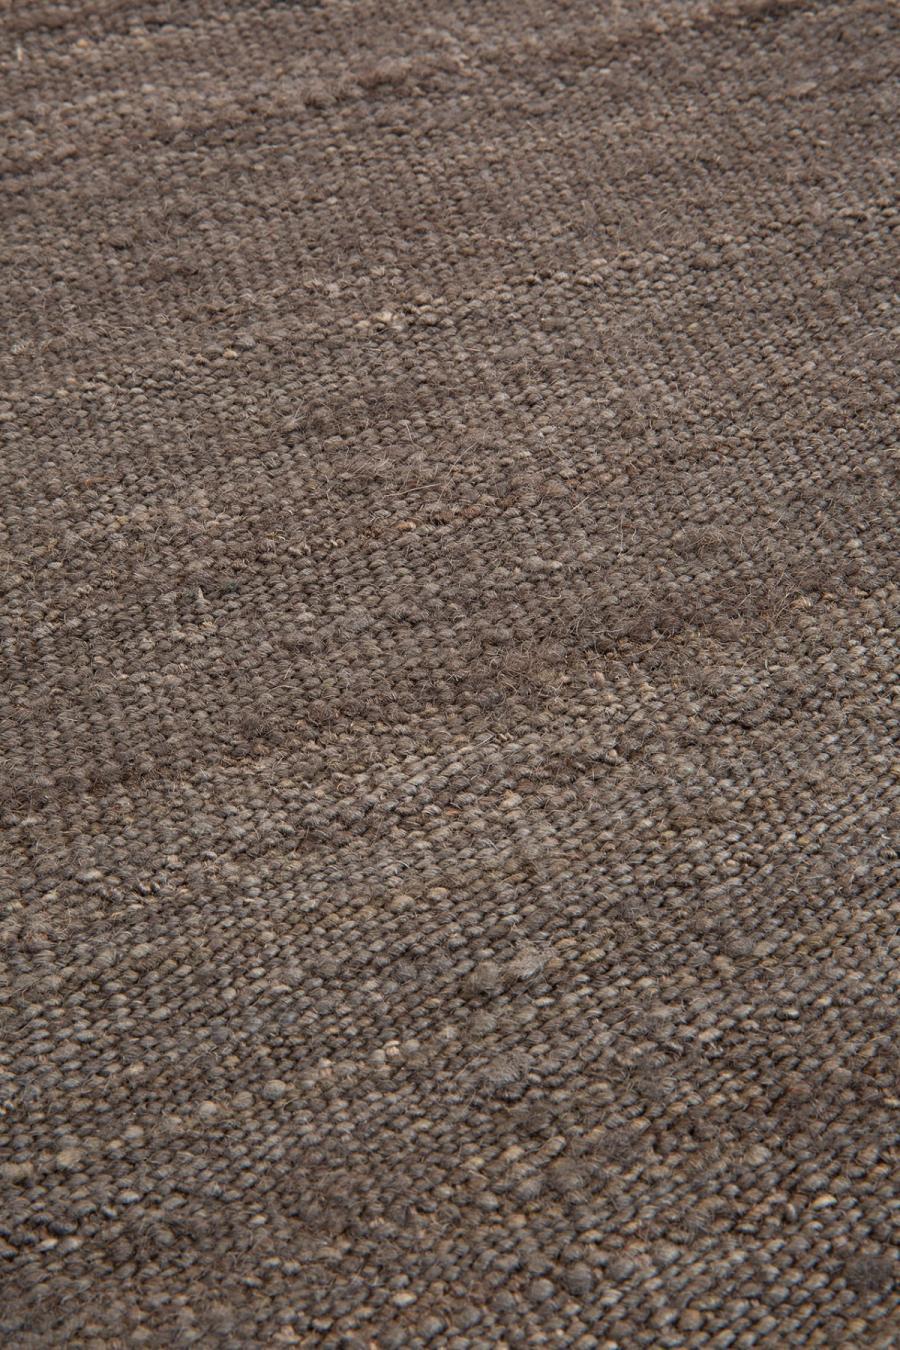 Ethnicraft - Diversen - Nomad kilim tapijt